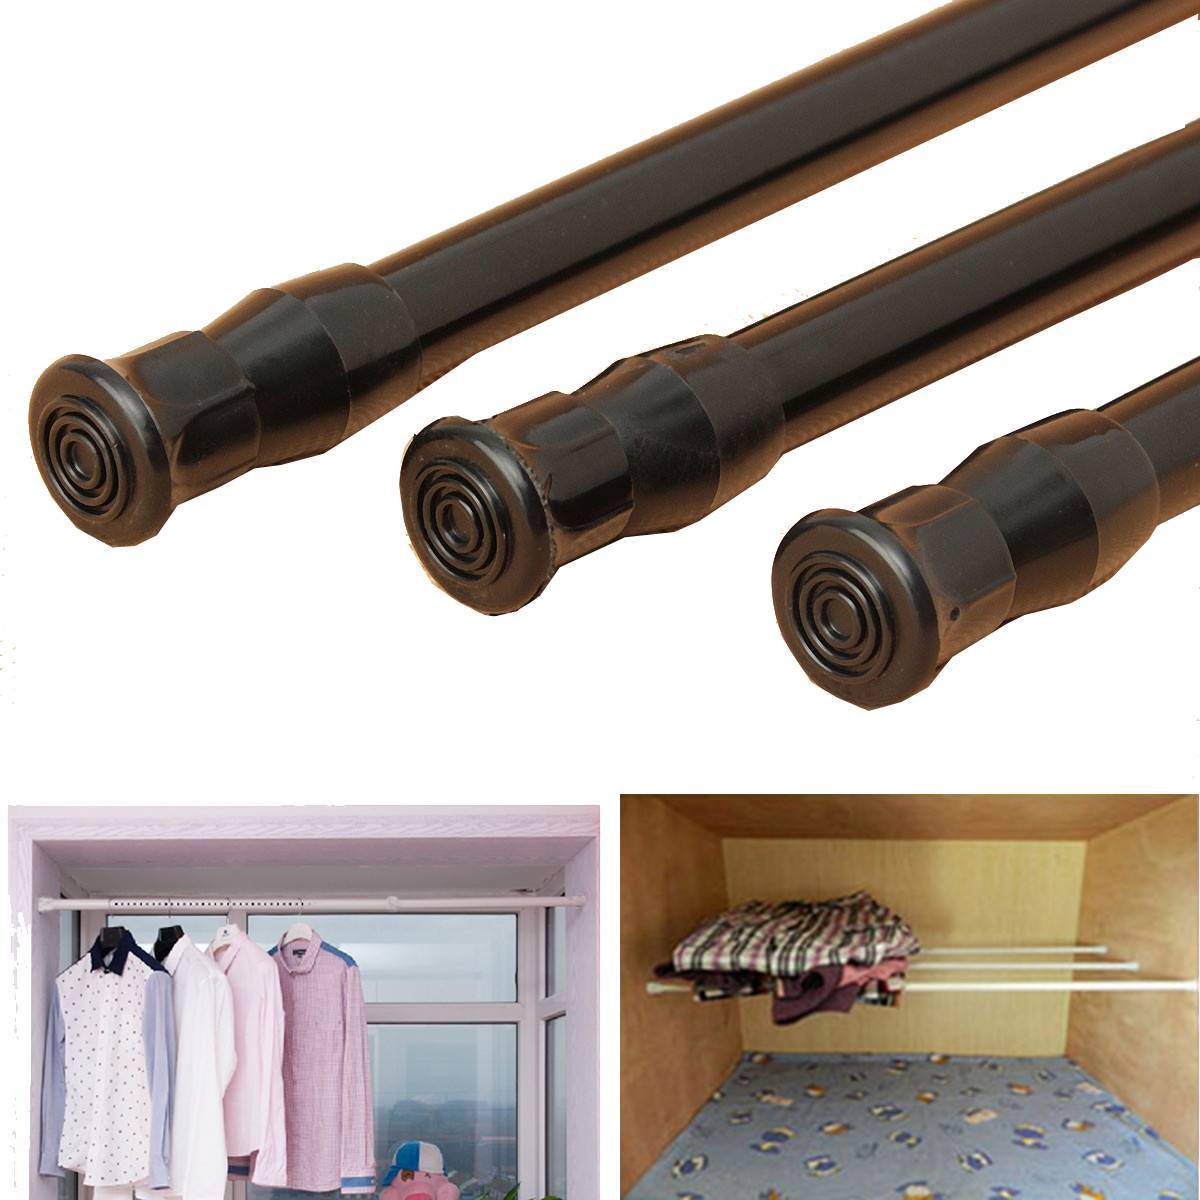 Black Extendable Adjustable Spring Tension Rail Telescopic Pole Window Curtain Shower Curtain Rod Wardrobe Bathroom Products